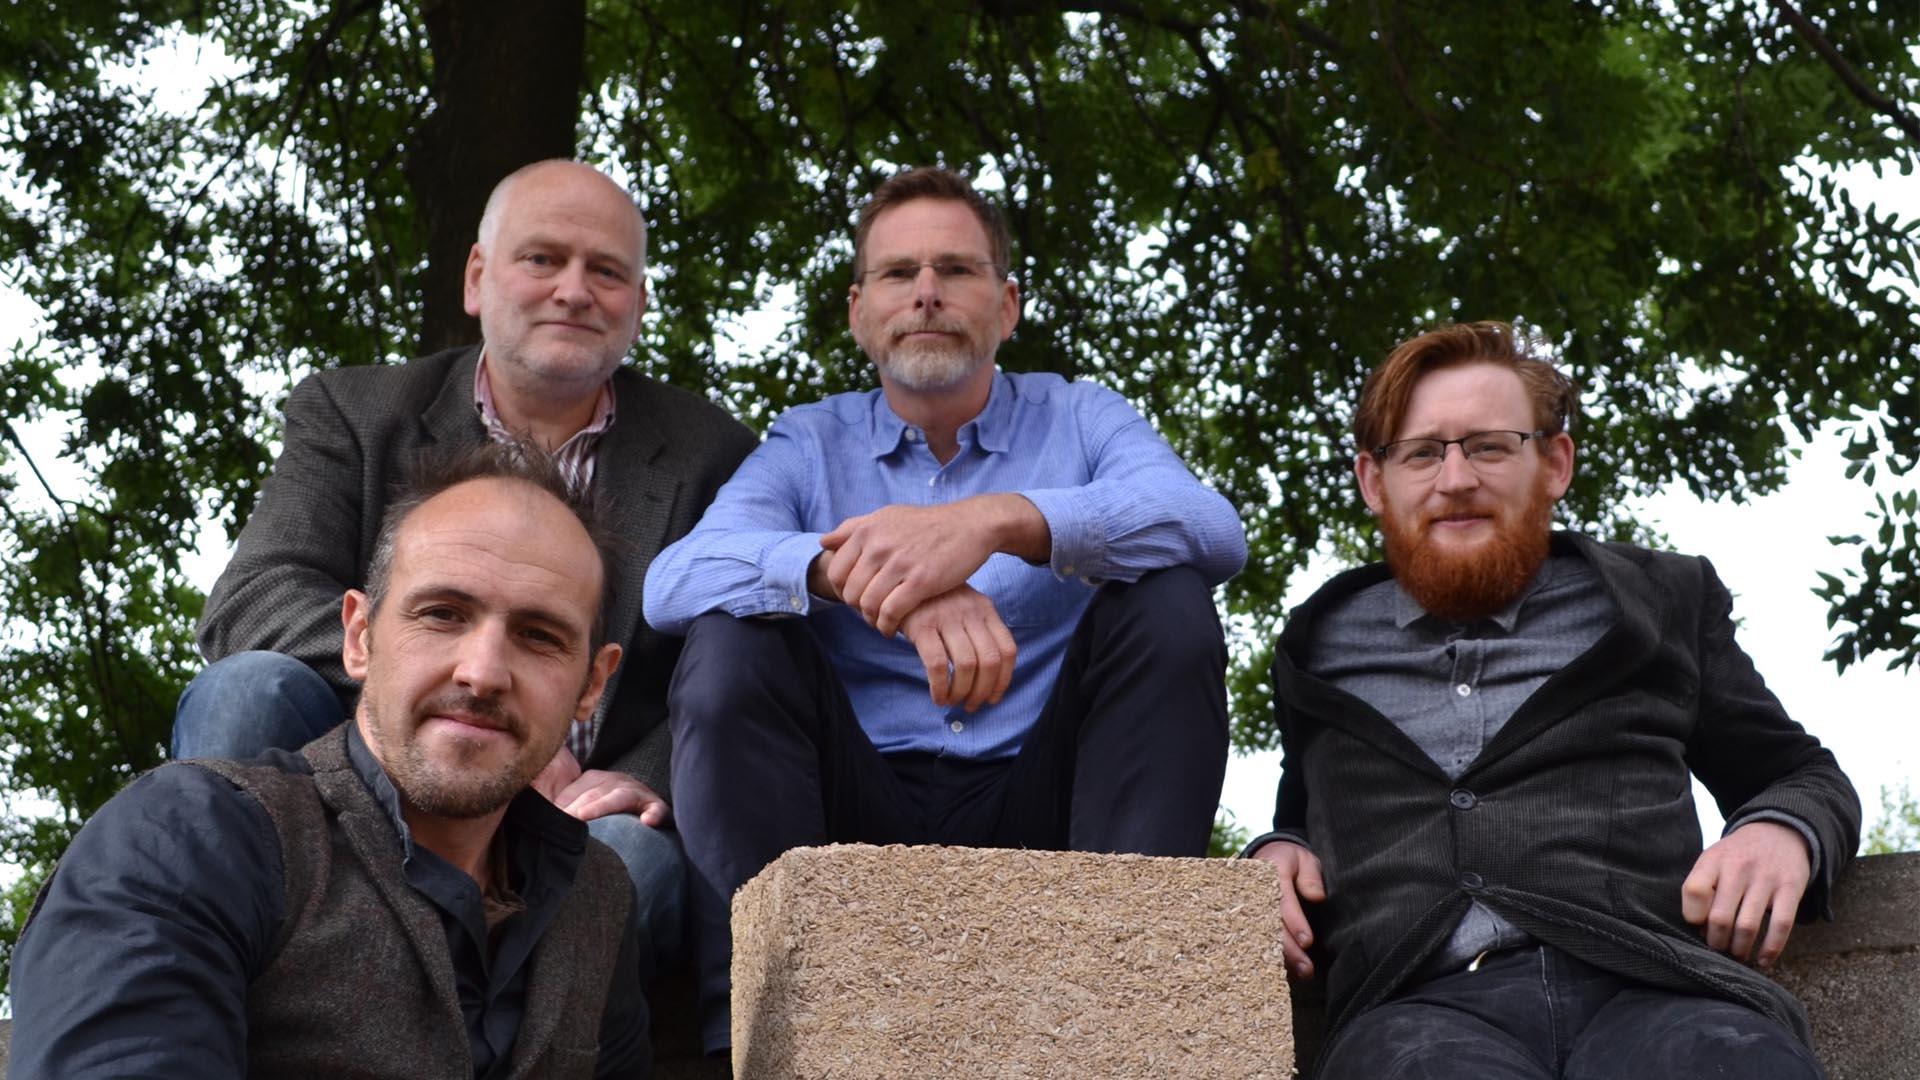 The Industrial Nature team, l-r: Sam Baumber, Ewan Mealyou, Scott Simpson, Euan Lochhead